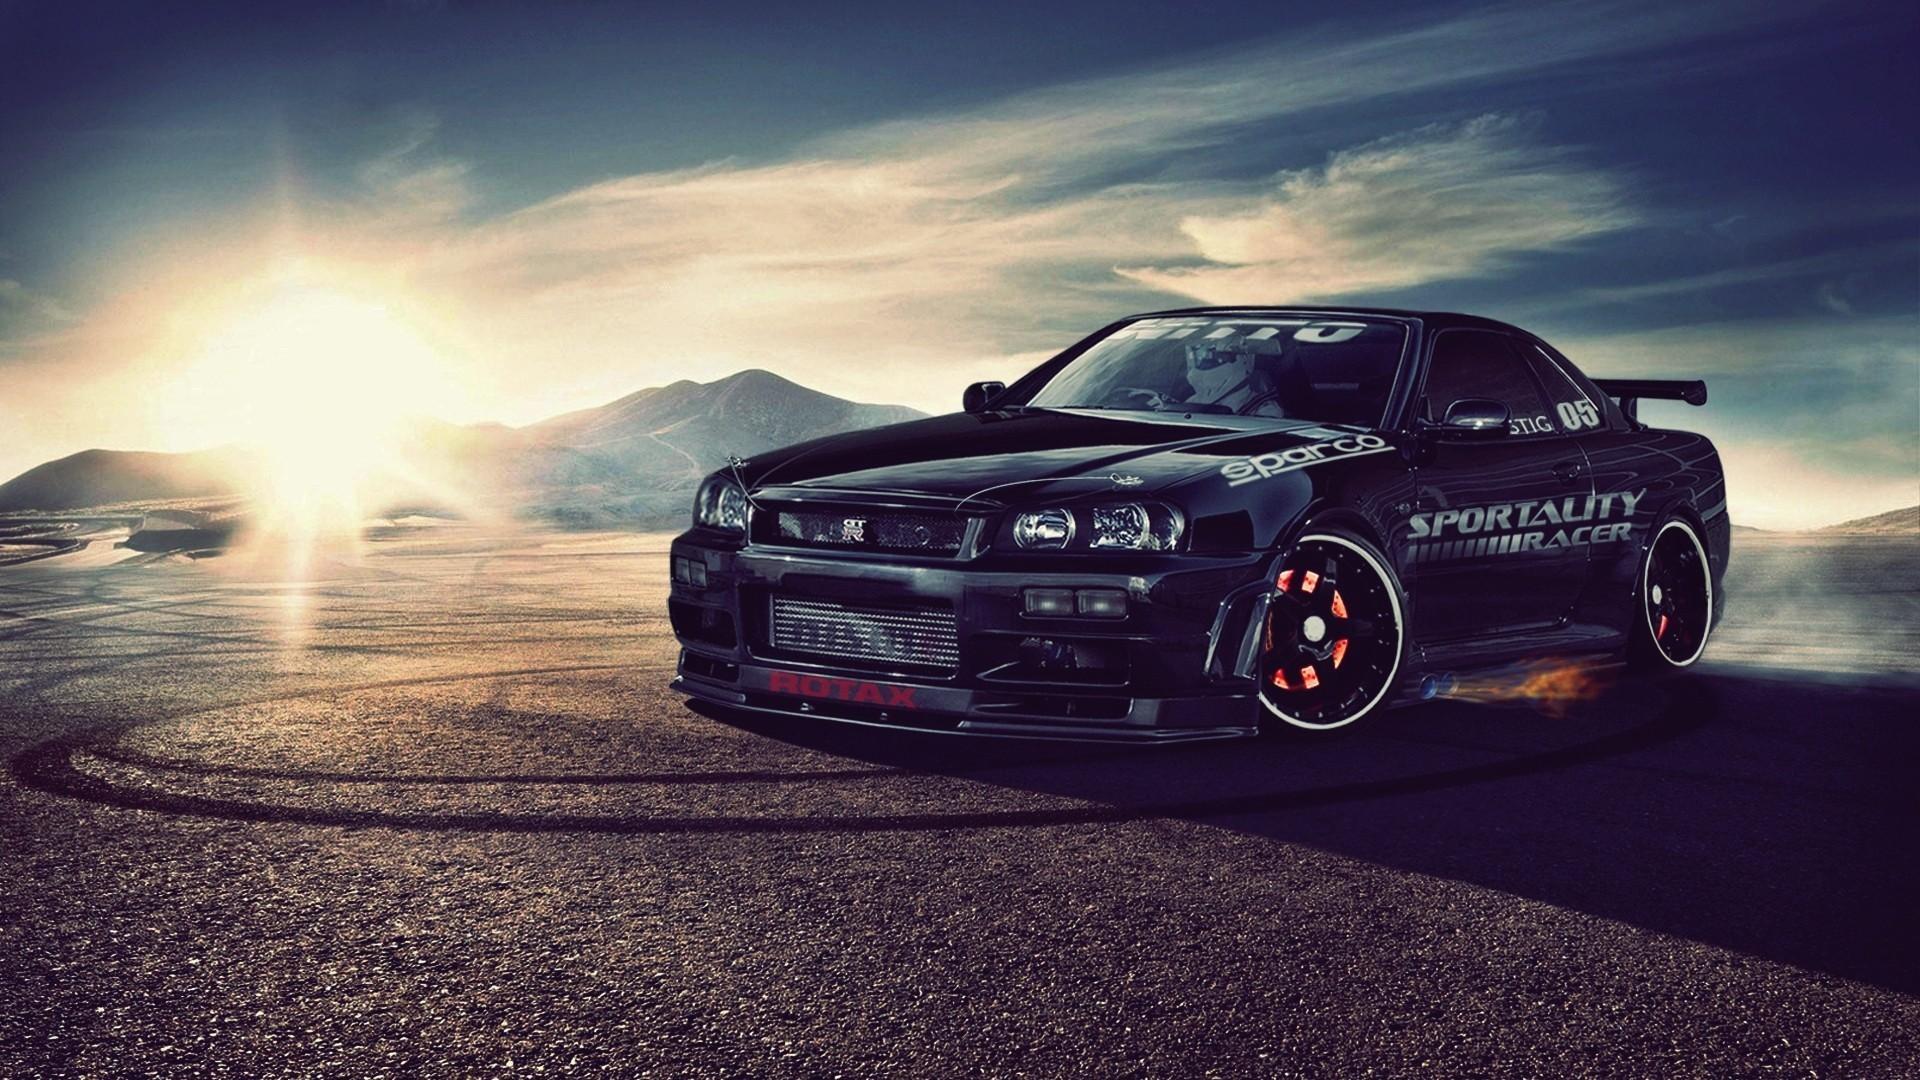 Res: 1920x1080, Nissan skyline r34 gt-r wallpaper